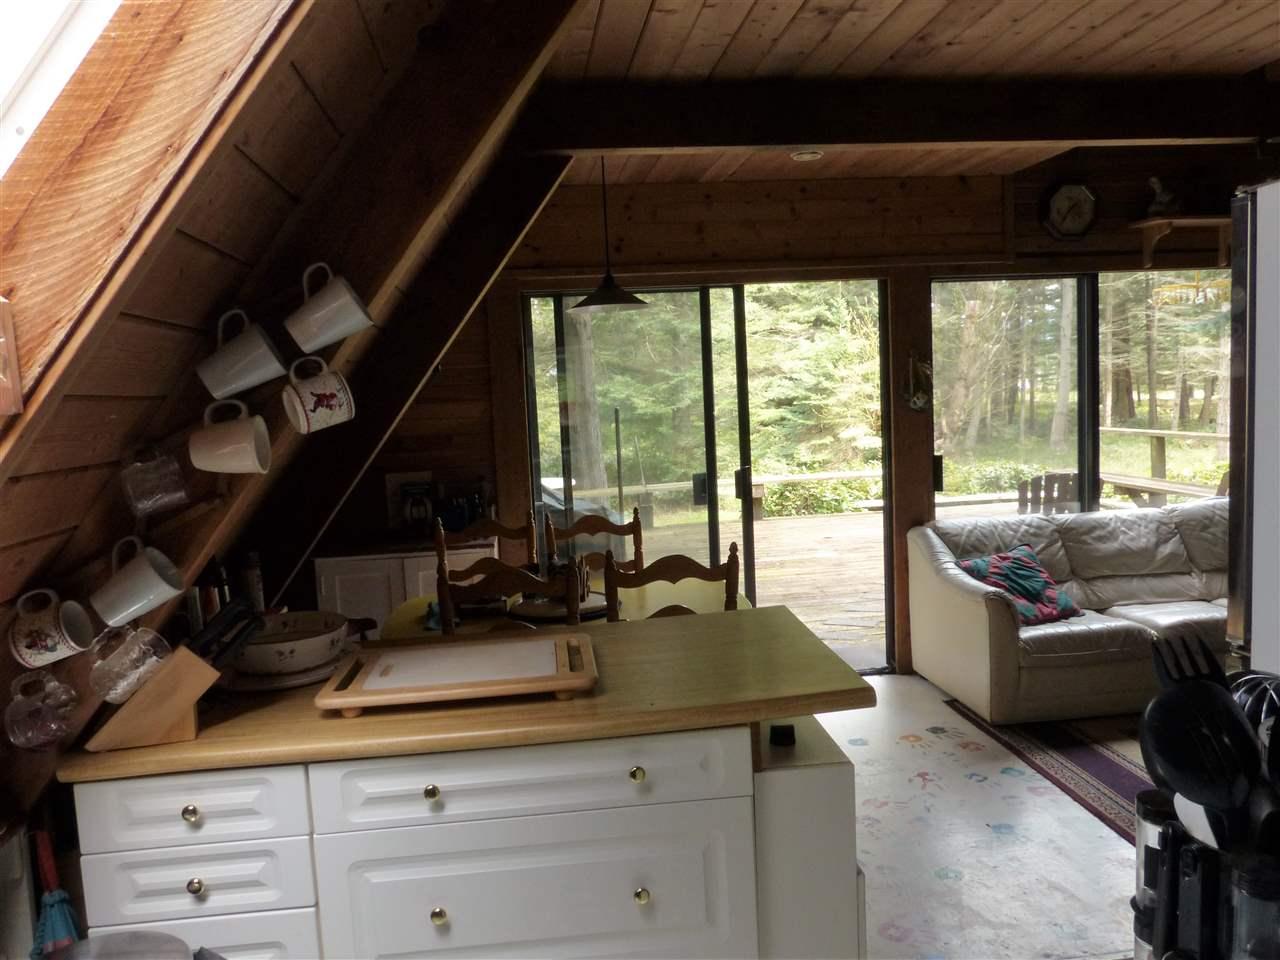 Recreational at 578 VAUCROFT ROAD, Sunshine Coast, British Columbia. Image 5